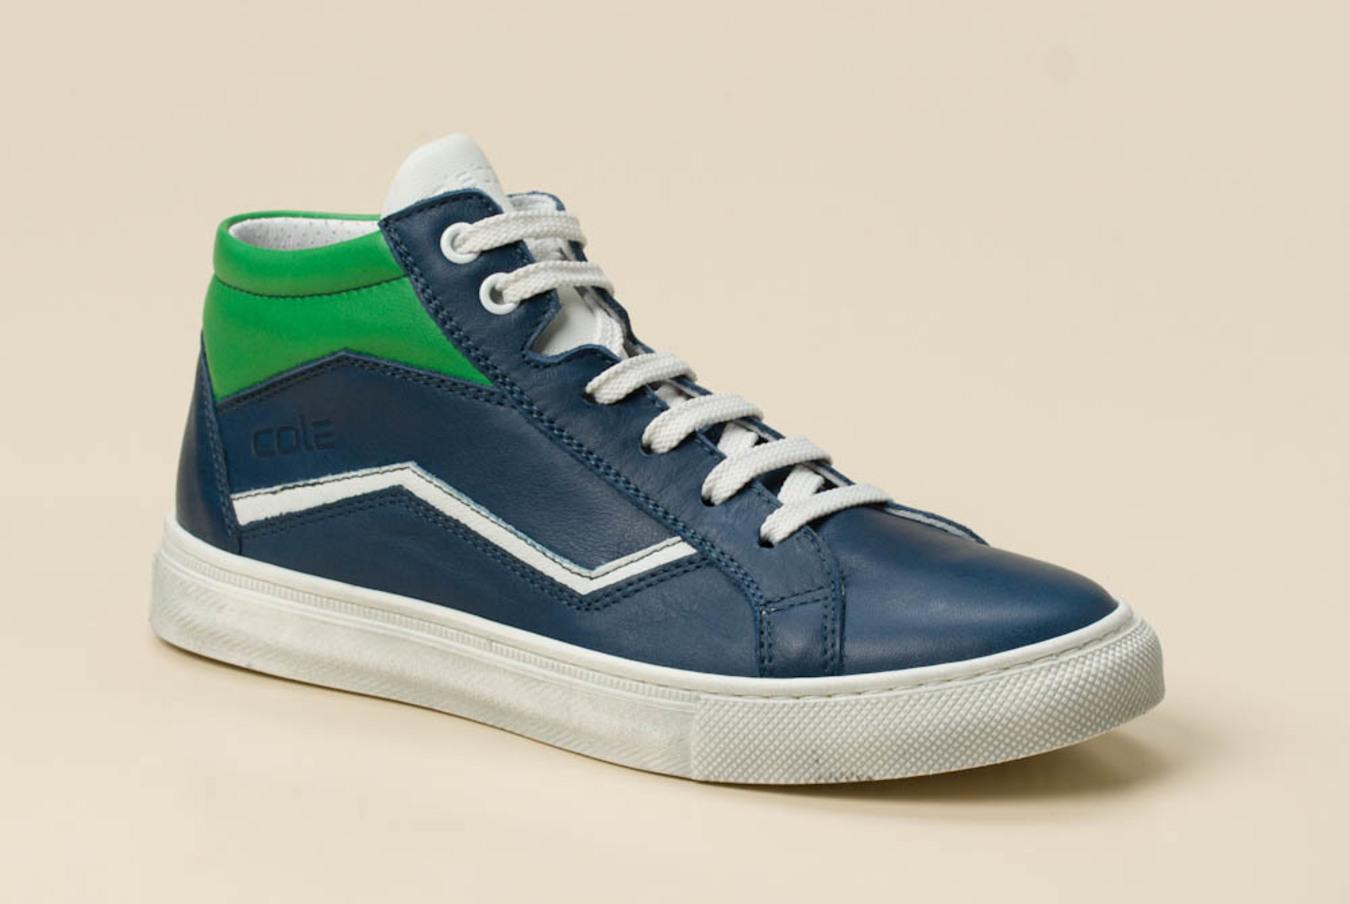 cab59ff7c28a30 cole bounce restore Kinder Sneaker high in blau grün kaufen ...